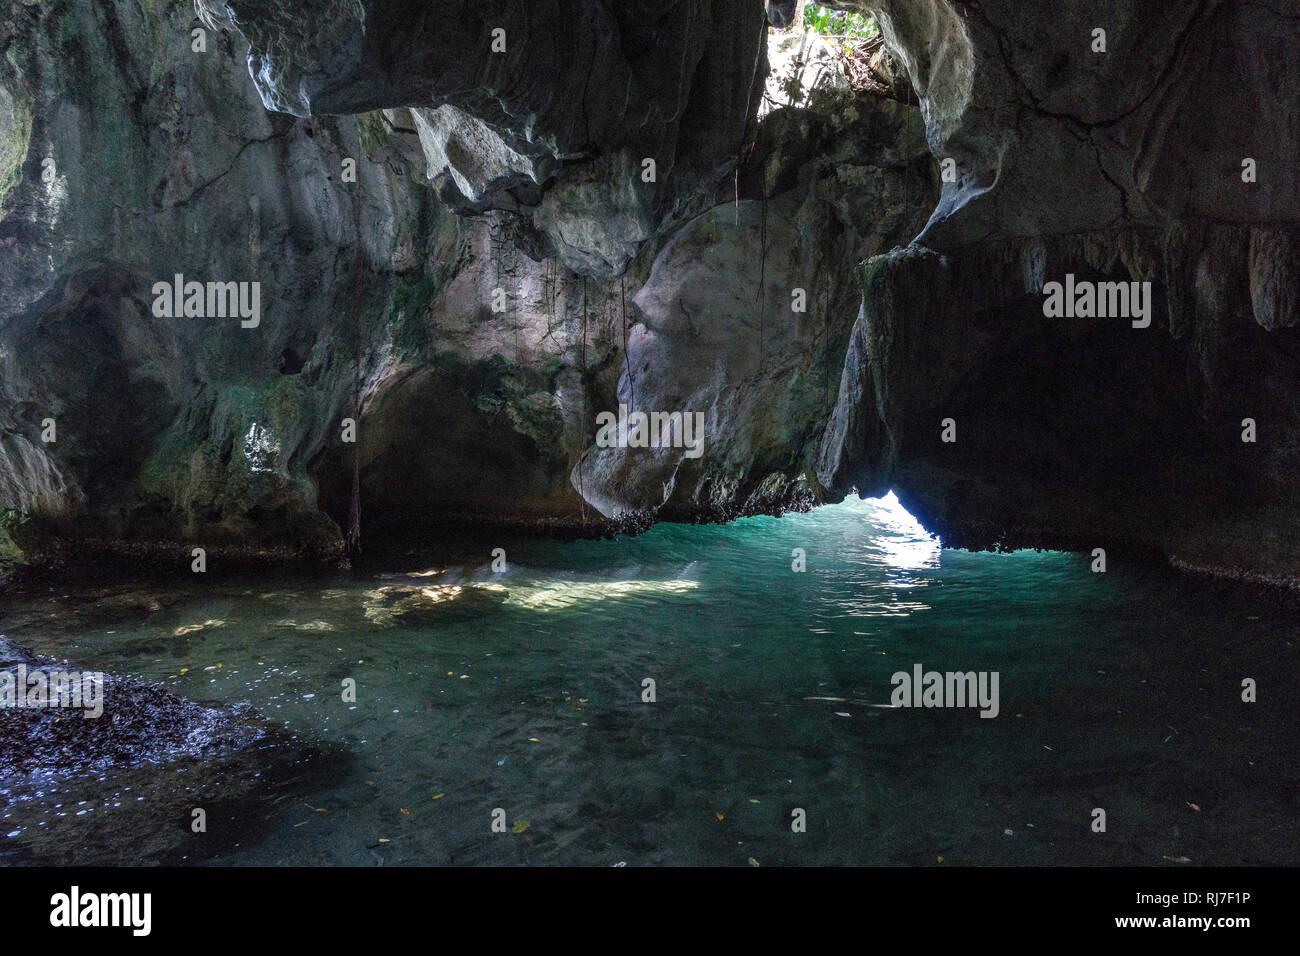 Große Antillen, Karibik Dominikanische Republik, Samana, Höhle, im Nationalpark Los Haitises Banque D'Images